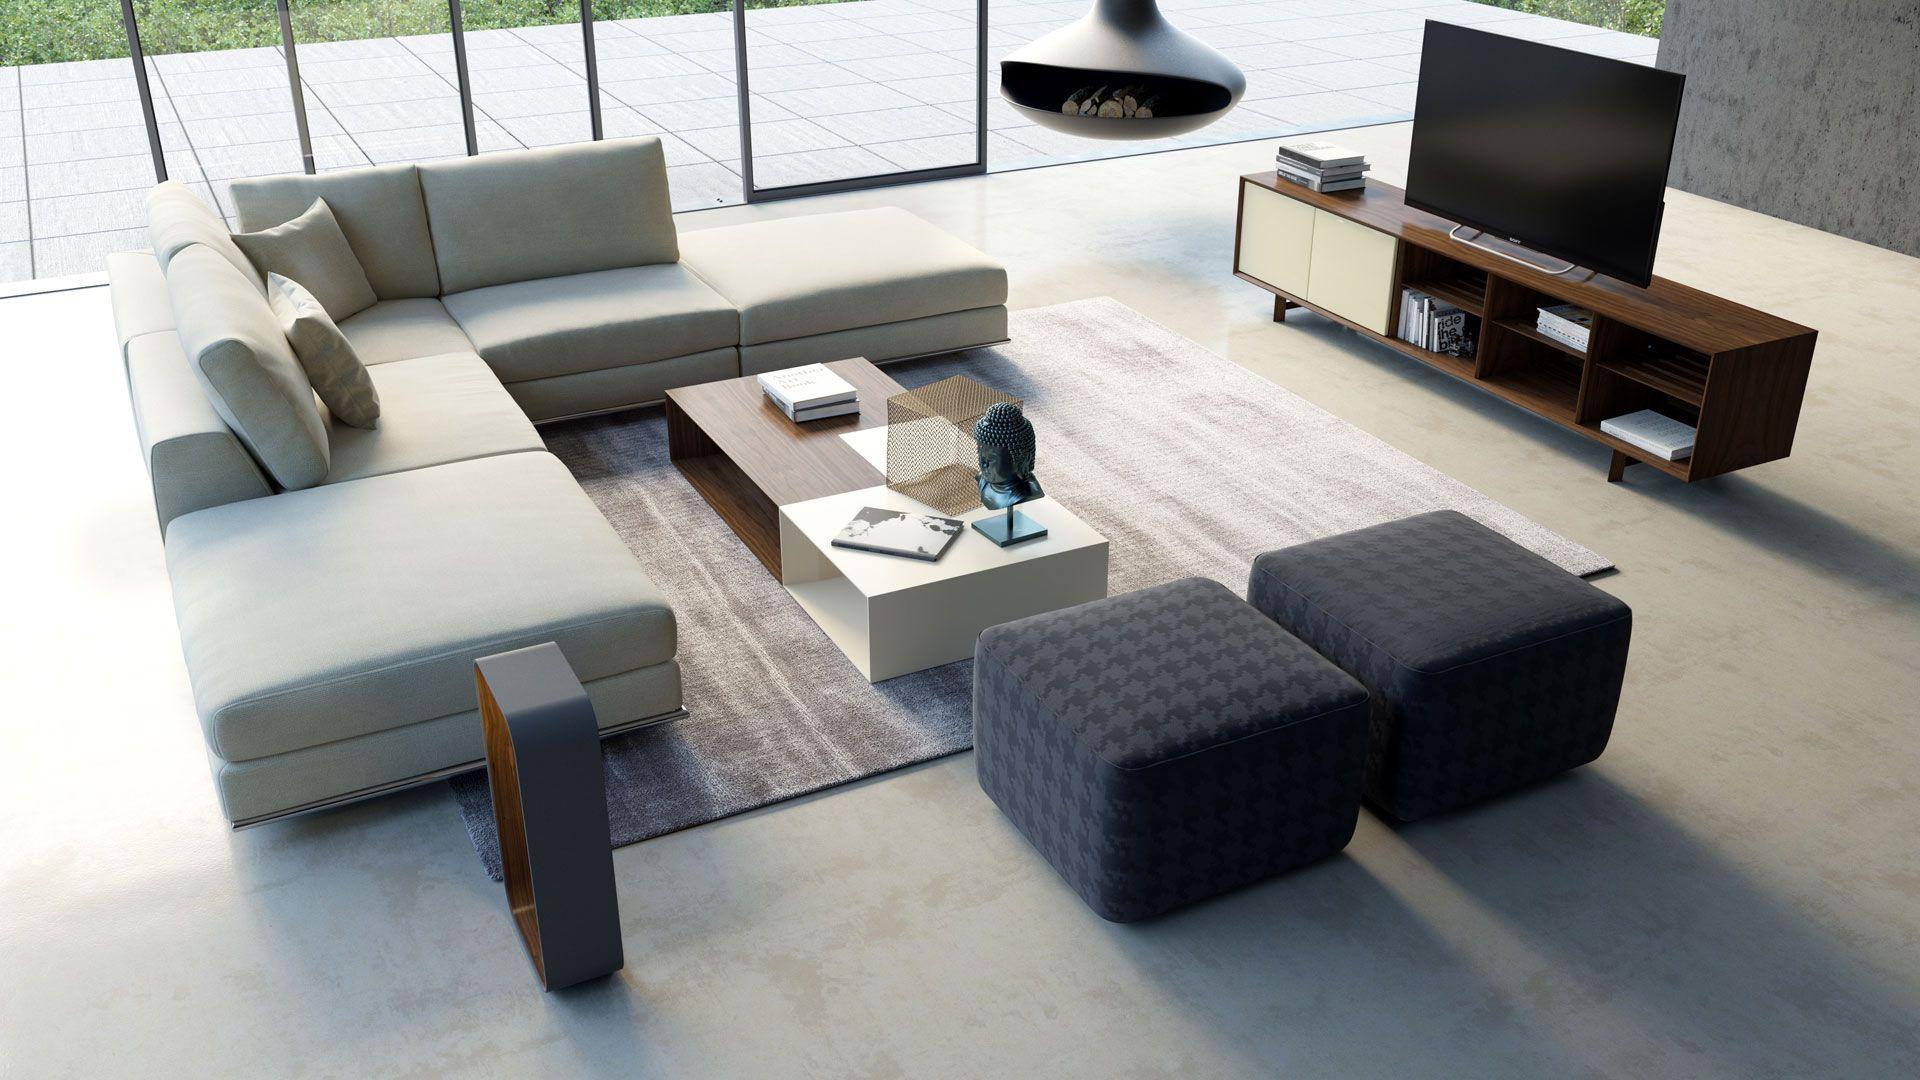 Sofa Set For Small Living Room Living Bedroom Furniture Furniture World Corner Sectional Sofa